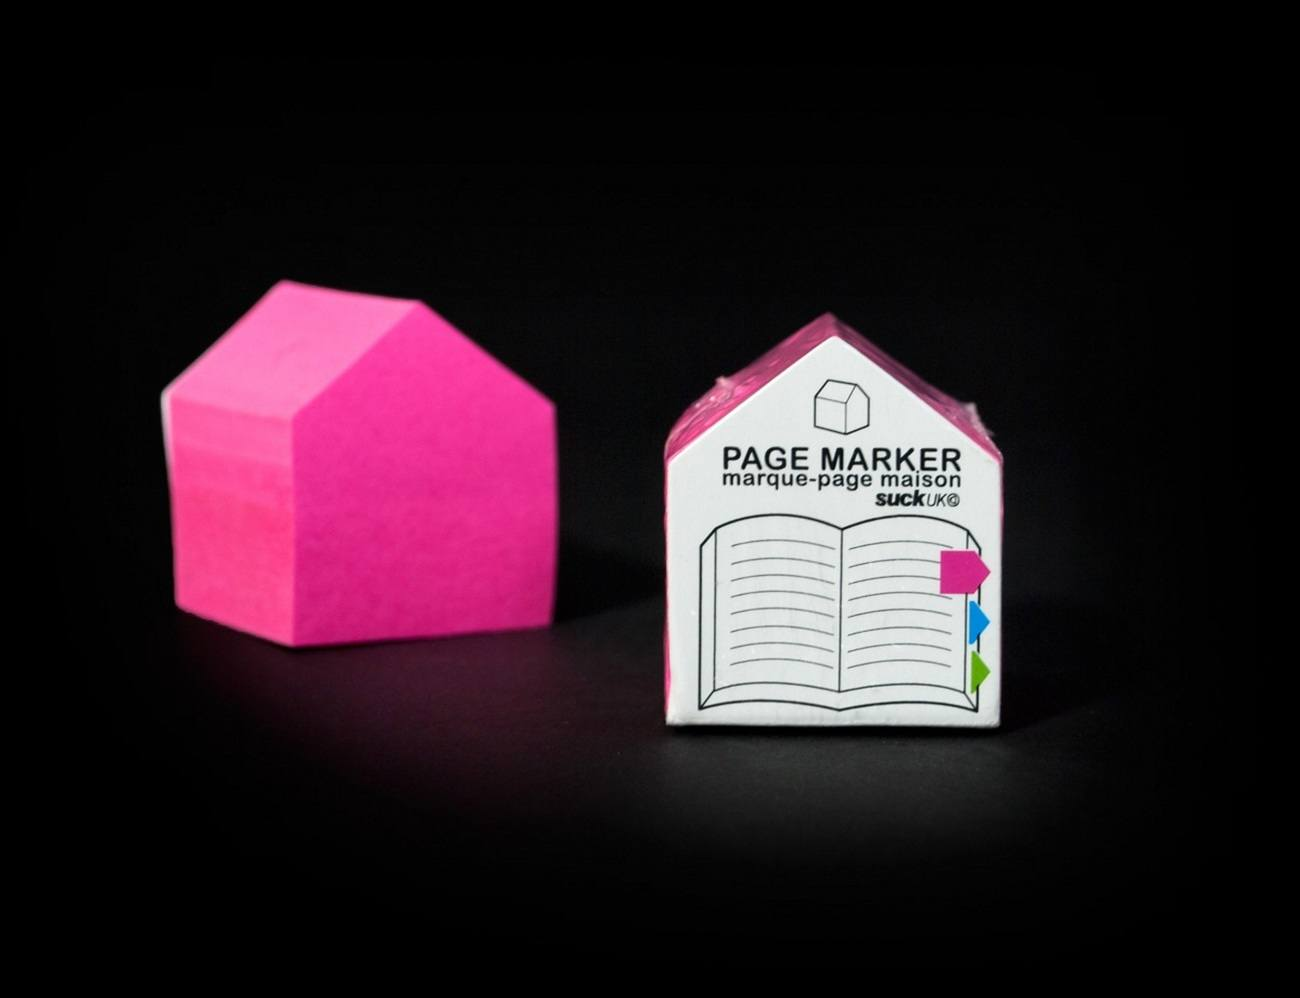 SUCK UK Sticky House Page Markers